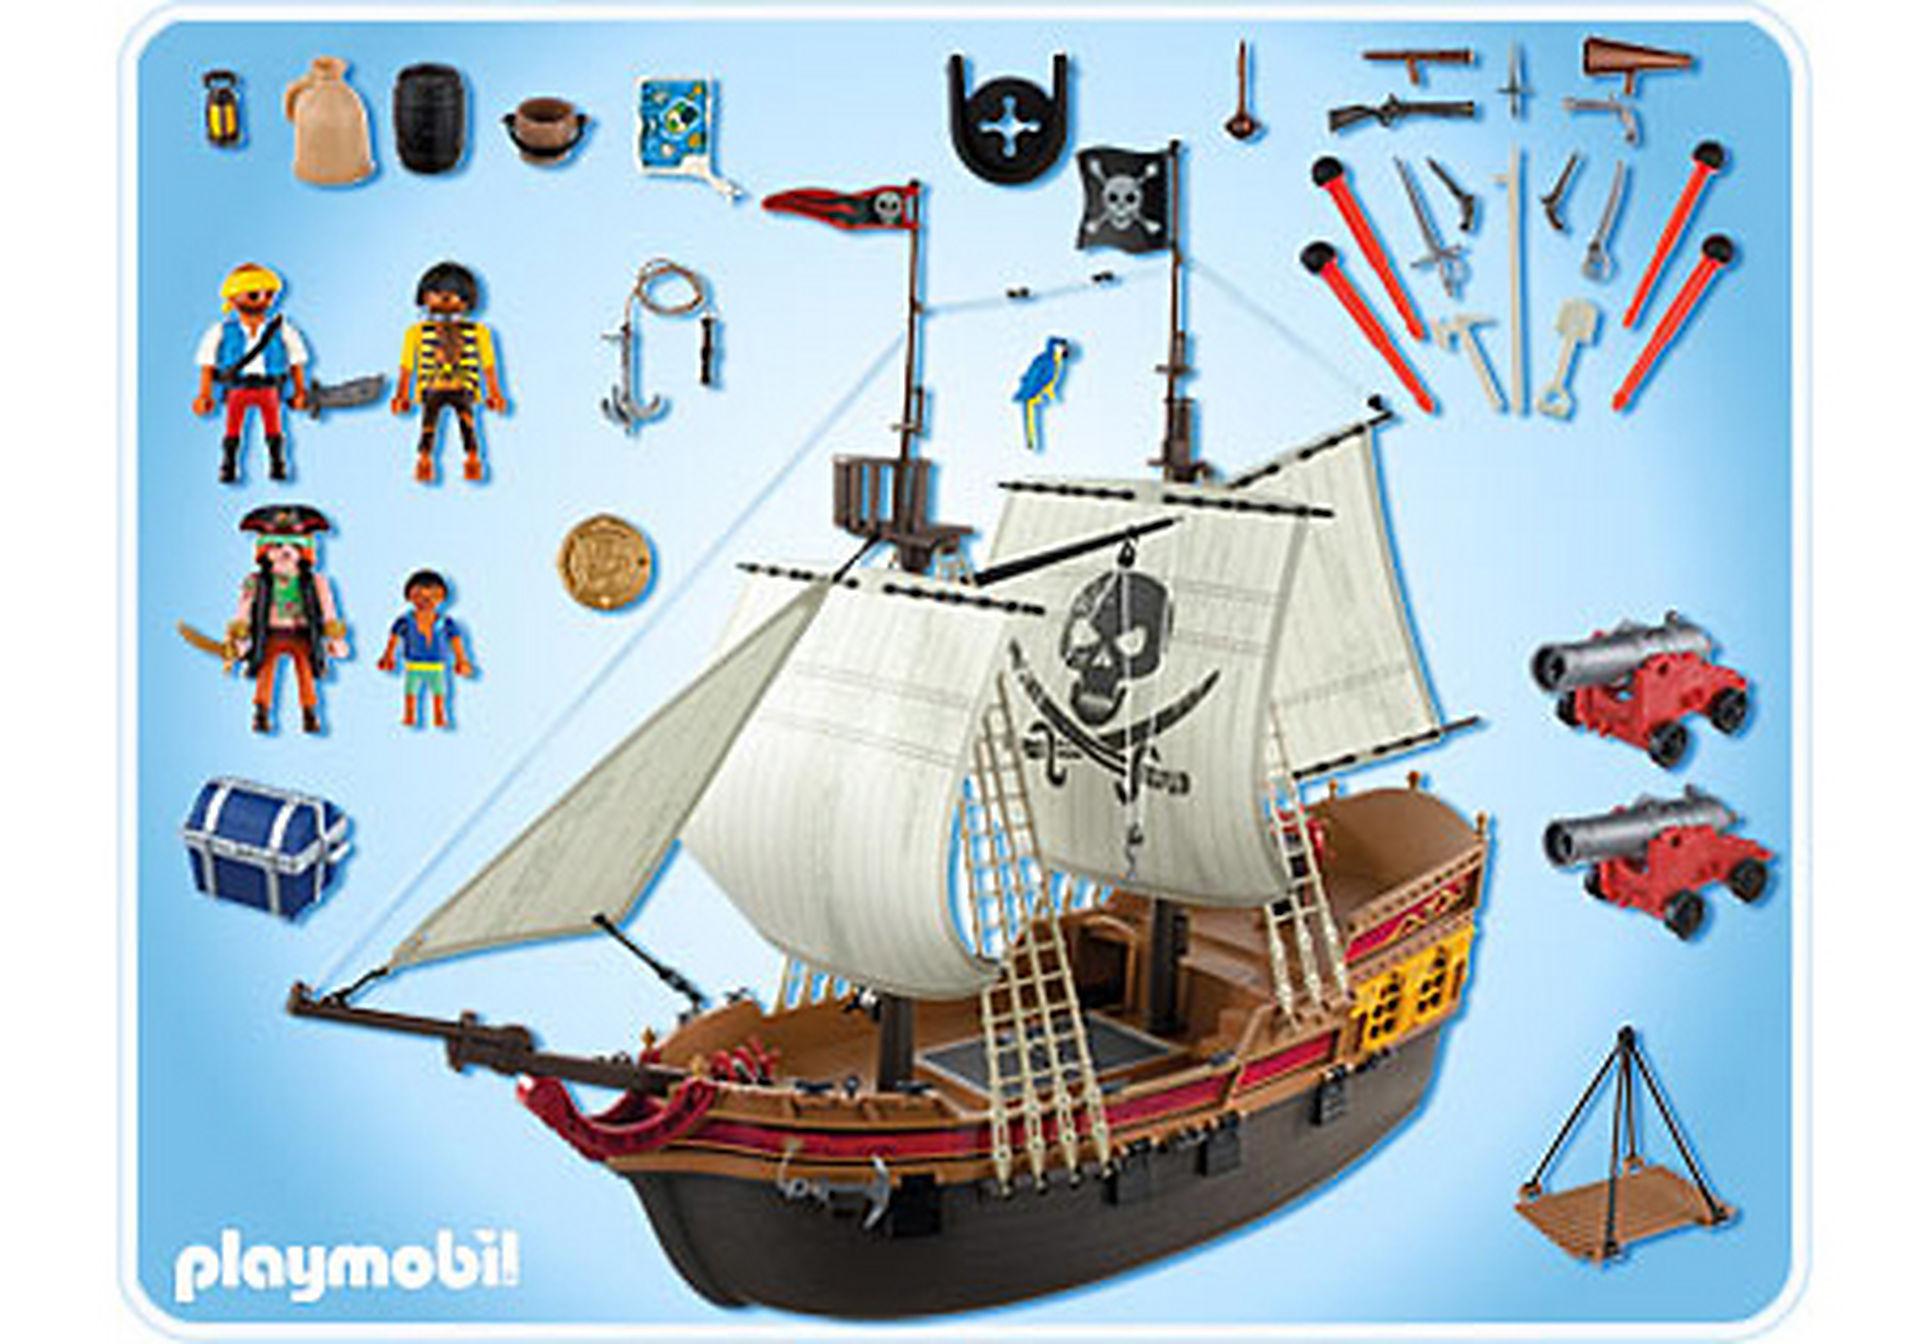 5135-A Piraten-Beuteschiff zoom image2